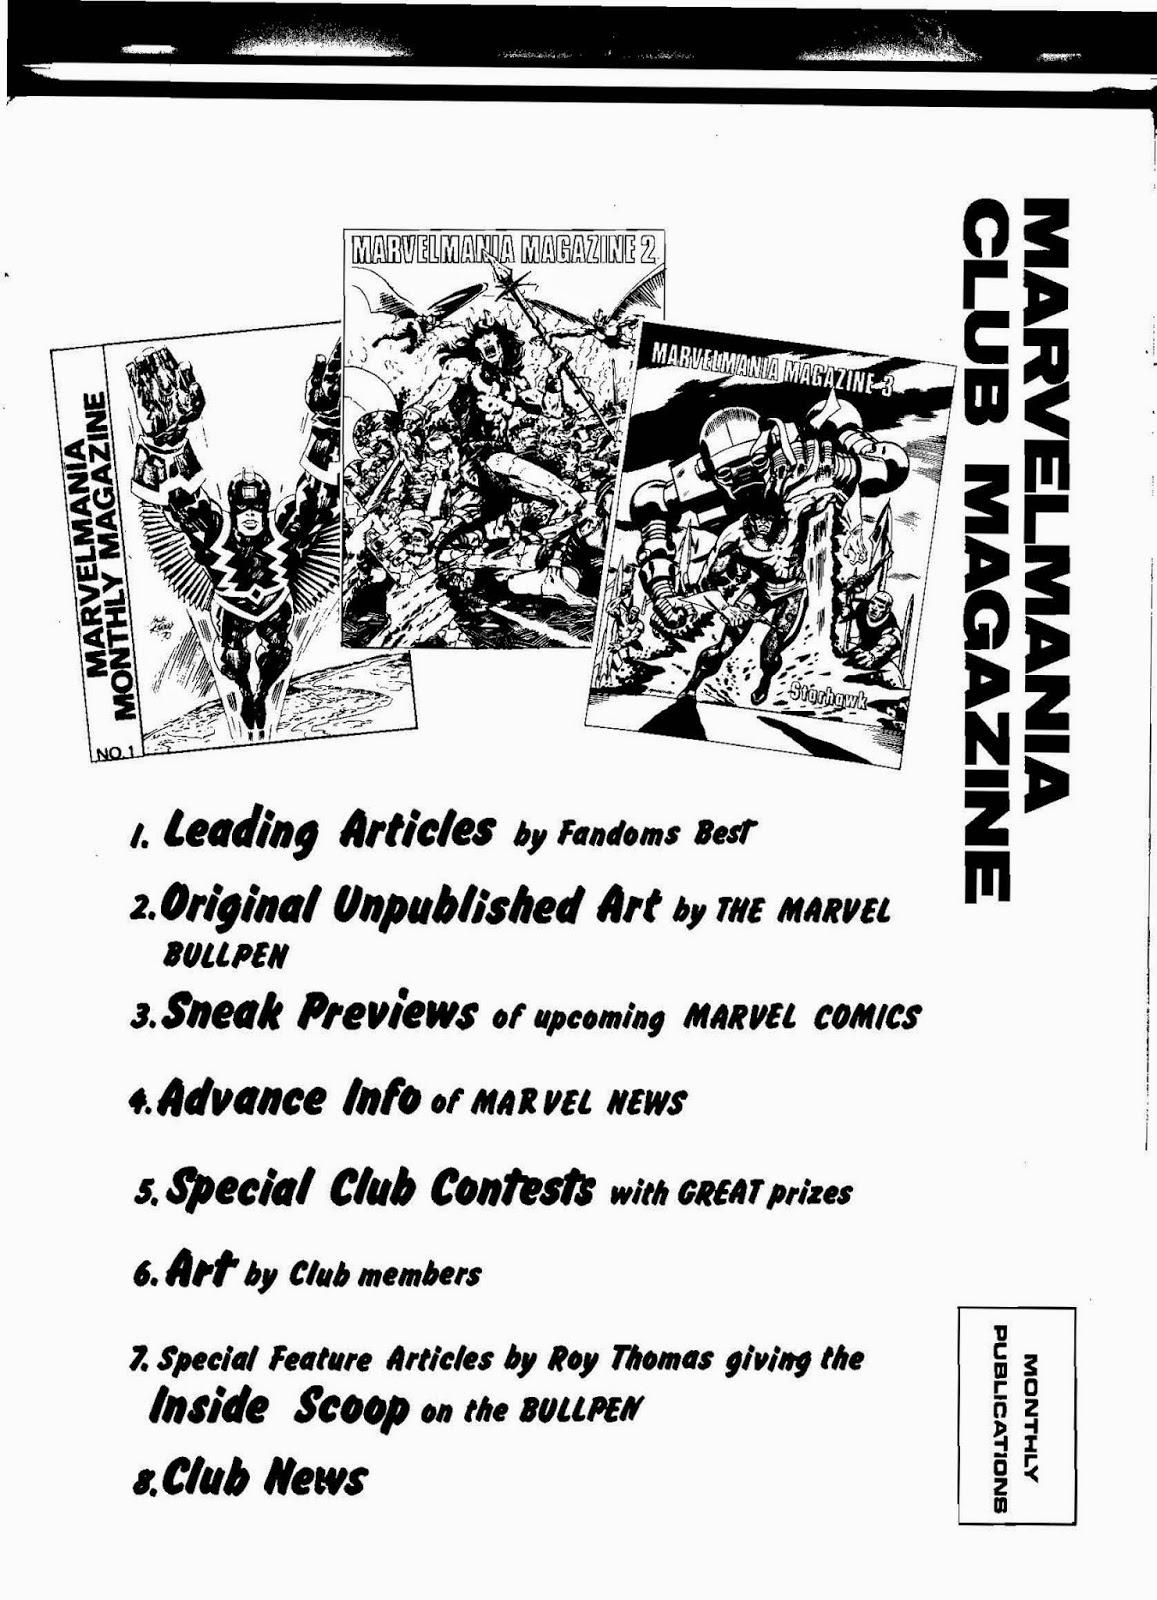 Barry's Pearls of Comic Book Wisdom: Marvelmania Catalogs